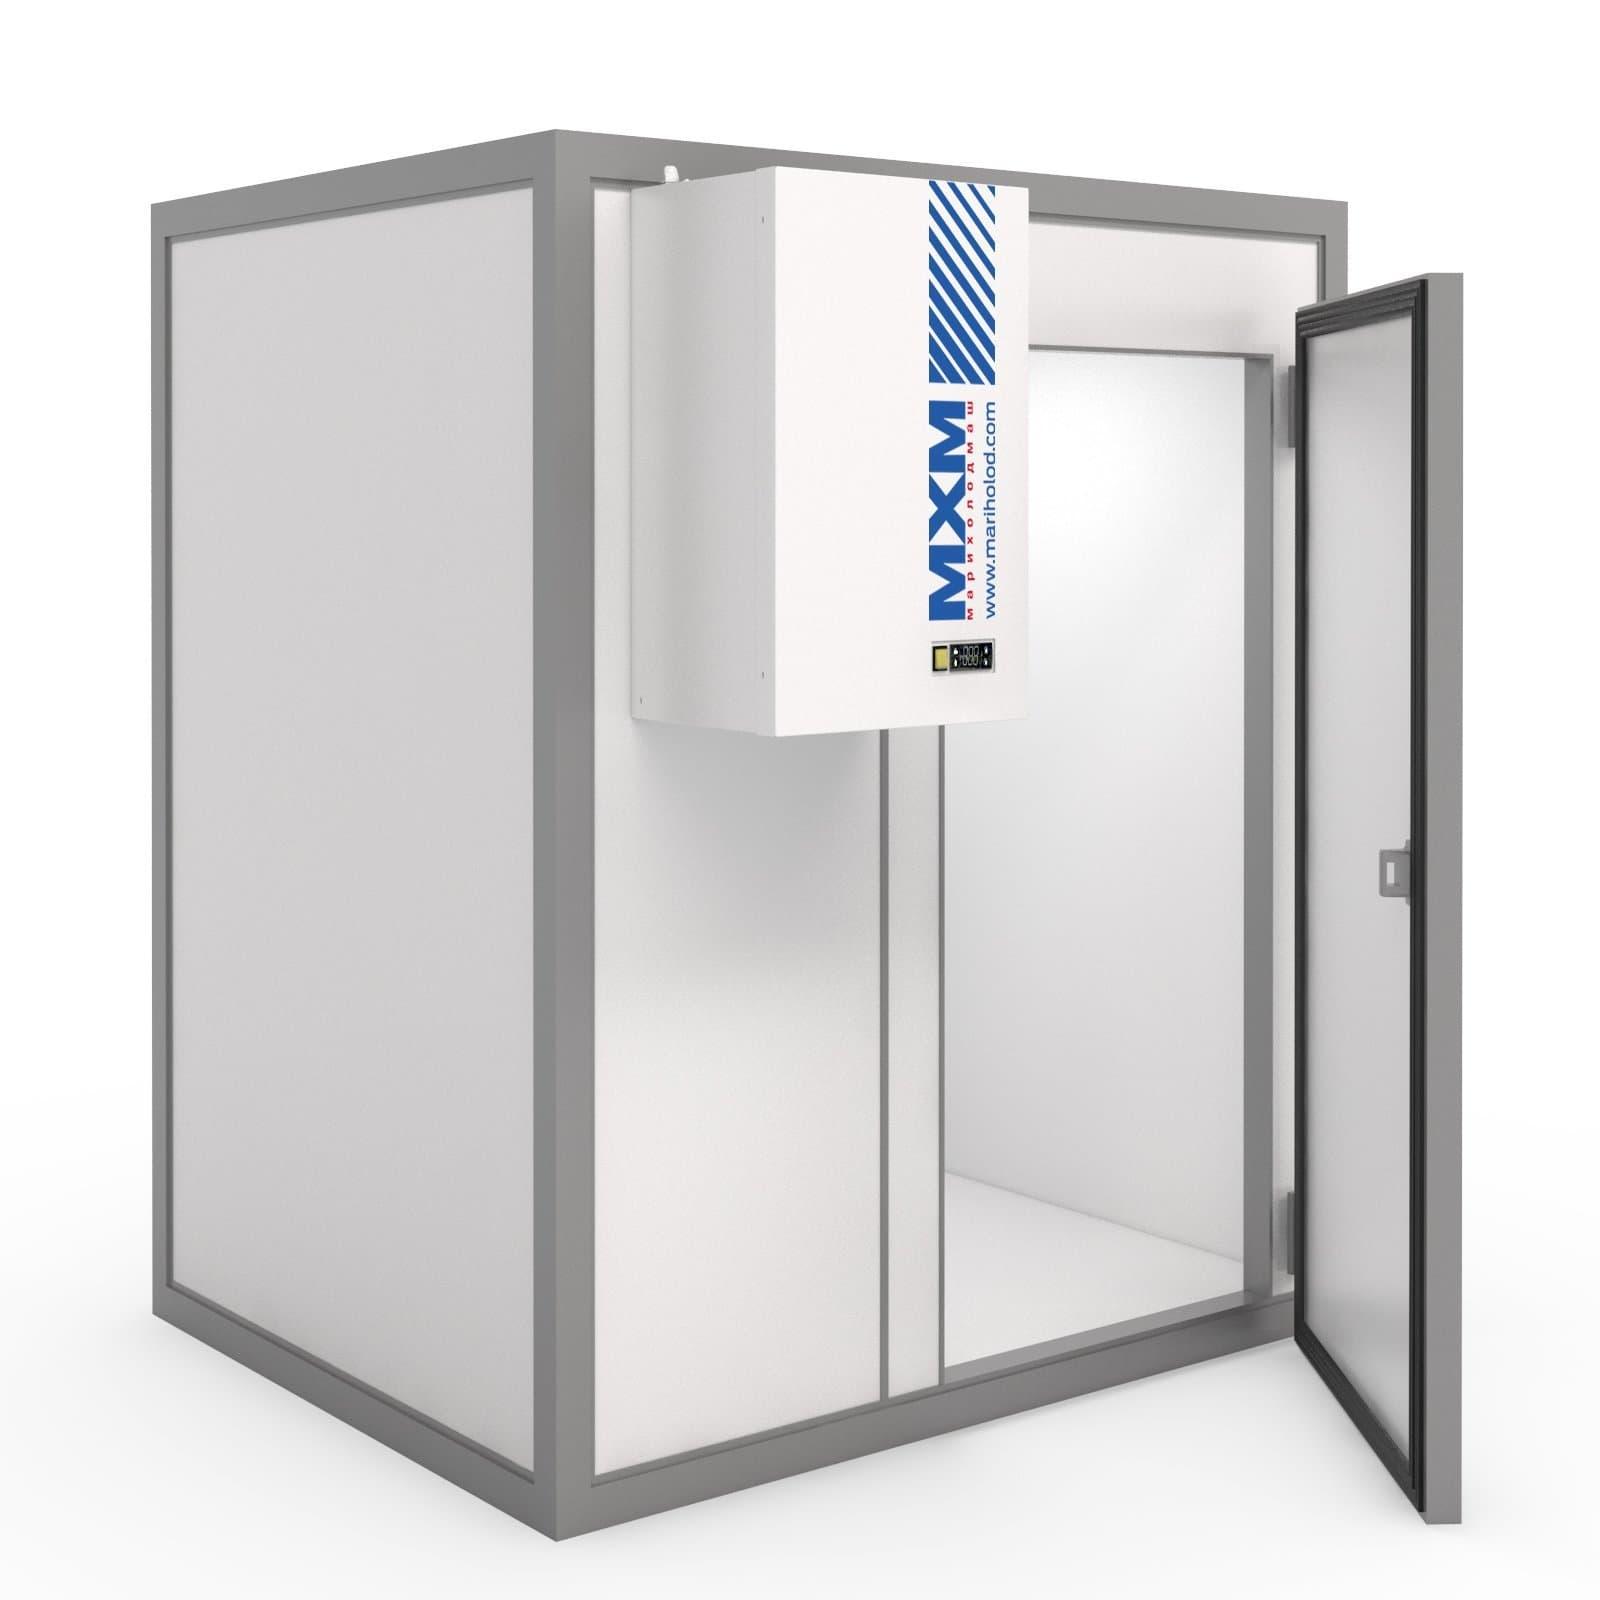 Камера холодильная МХМ КХН-24,84 2560×4660×2460